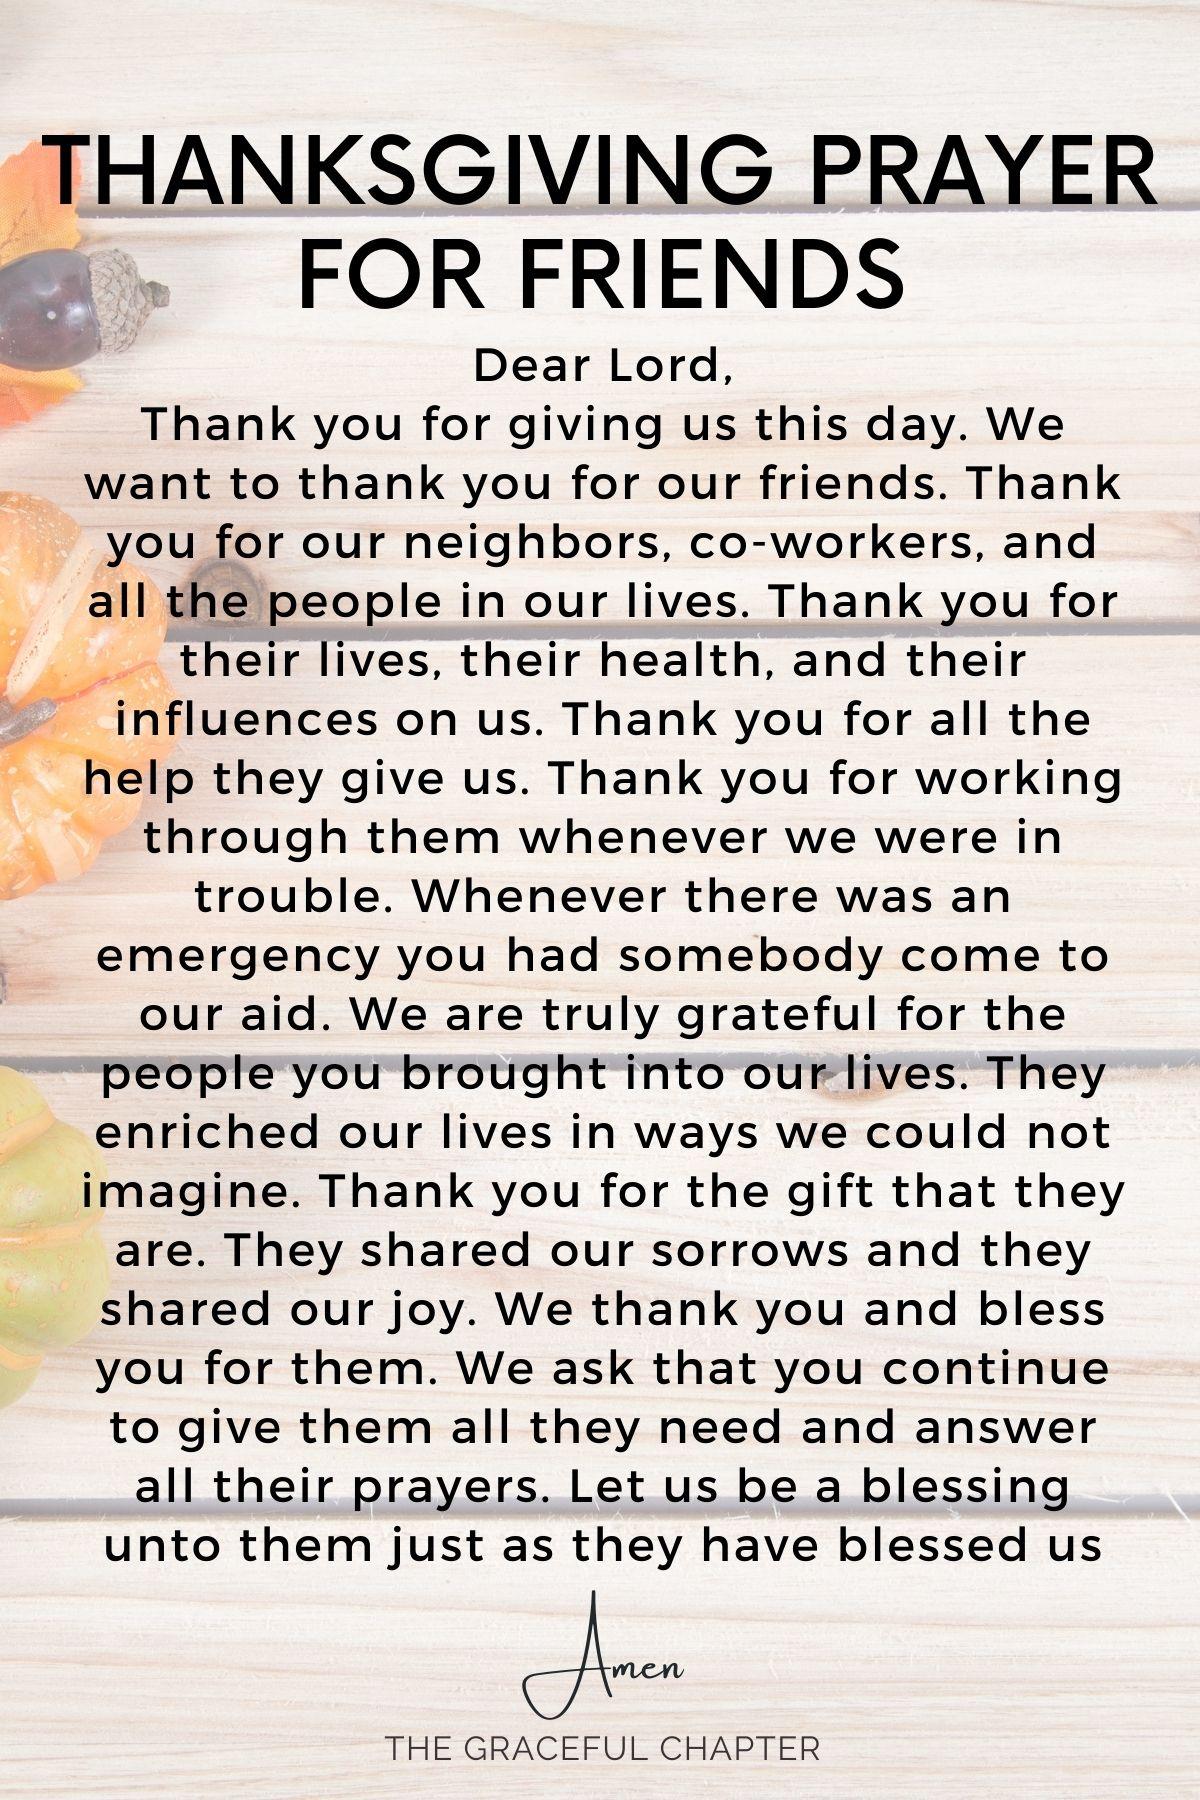 Thanksgiving prayer for friends